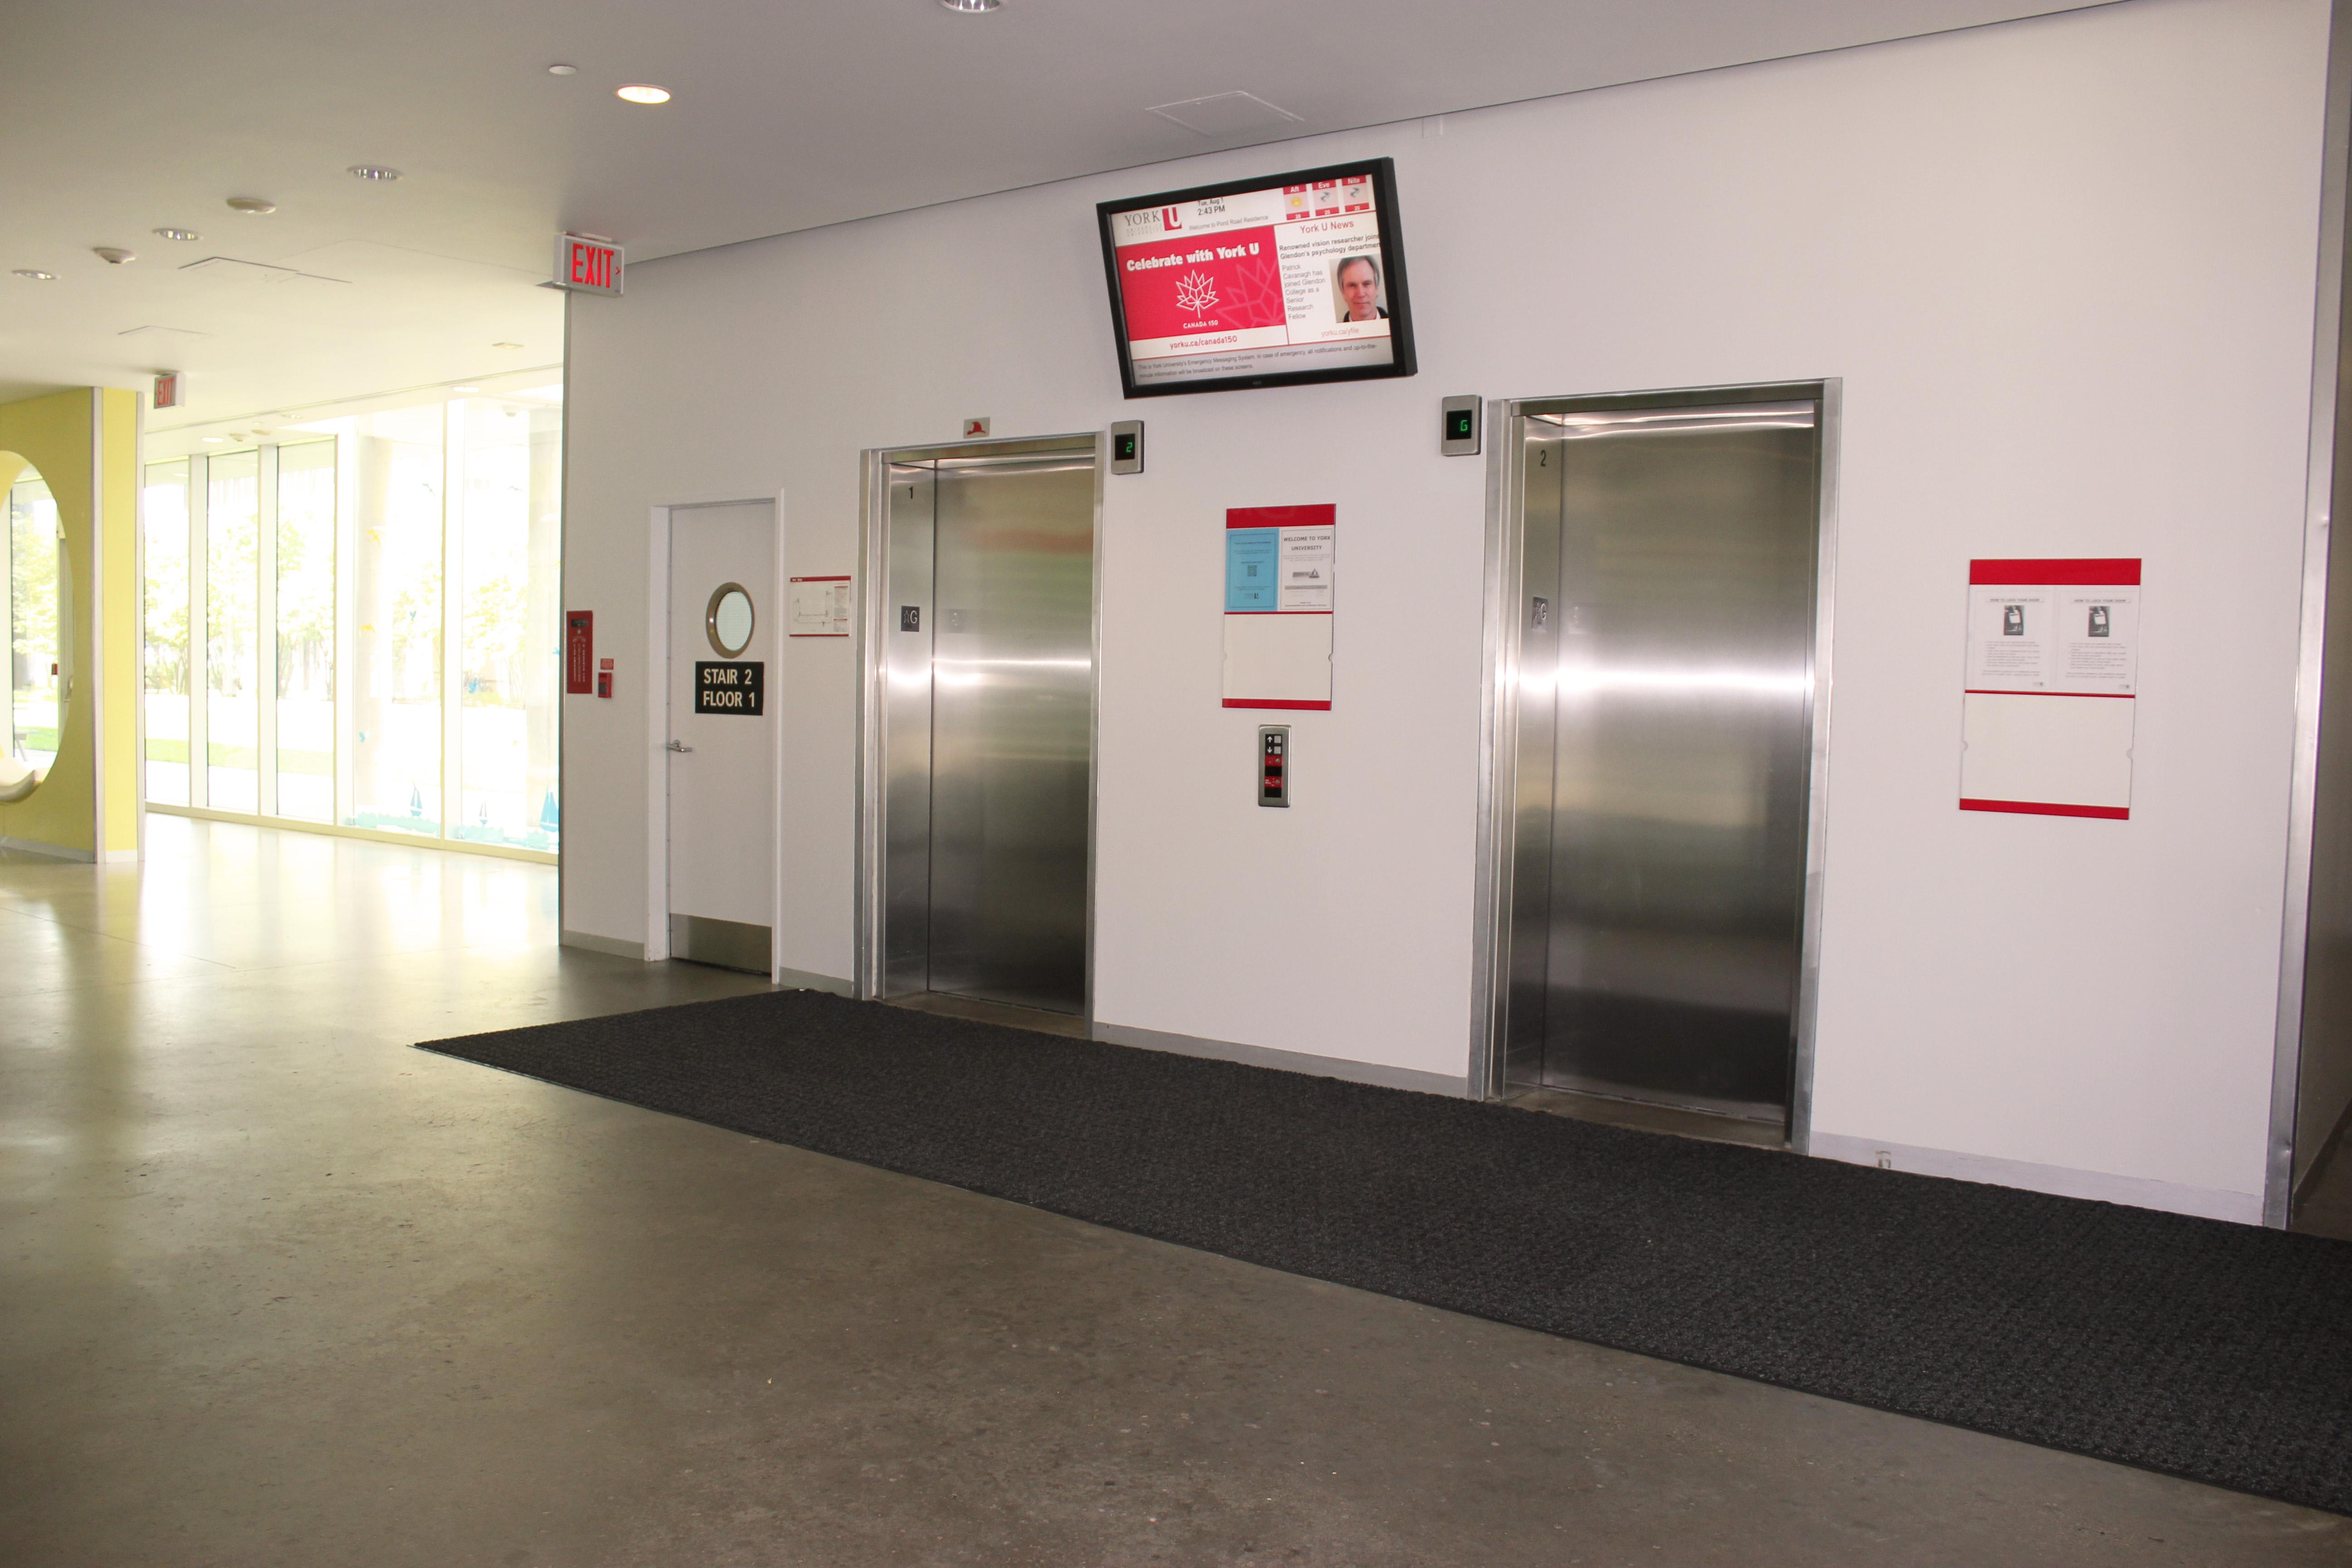 Pond interior, elevators